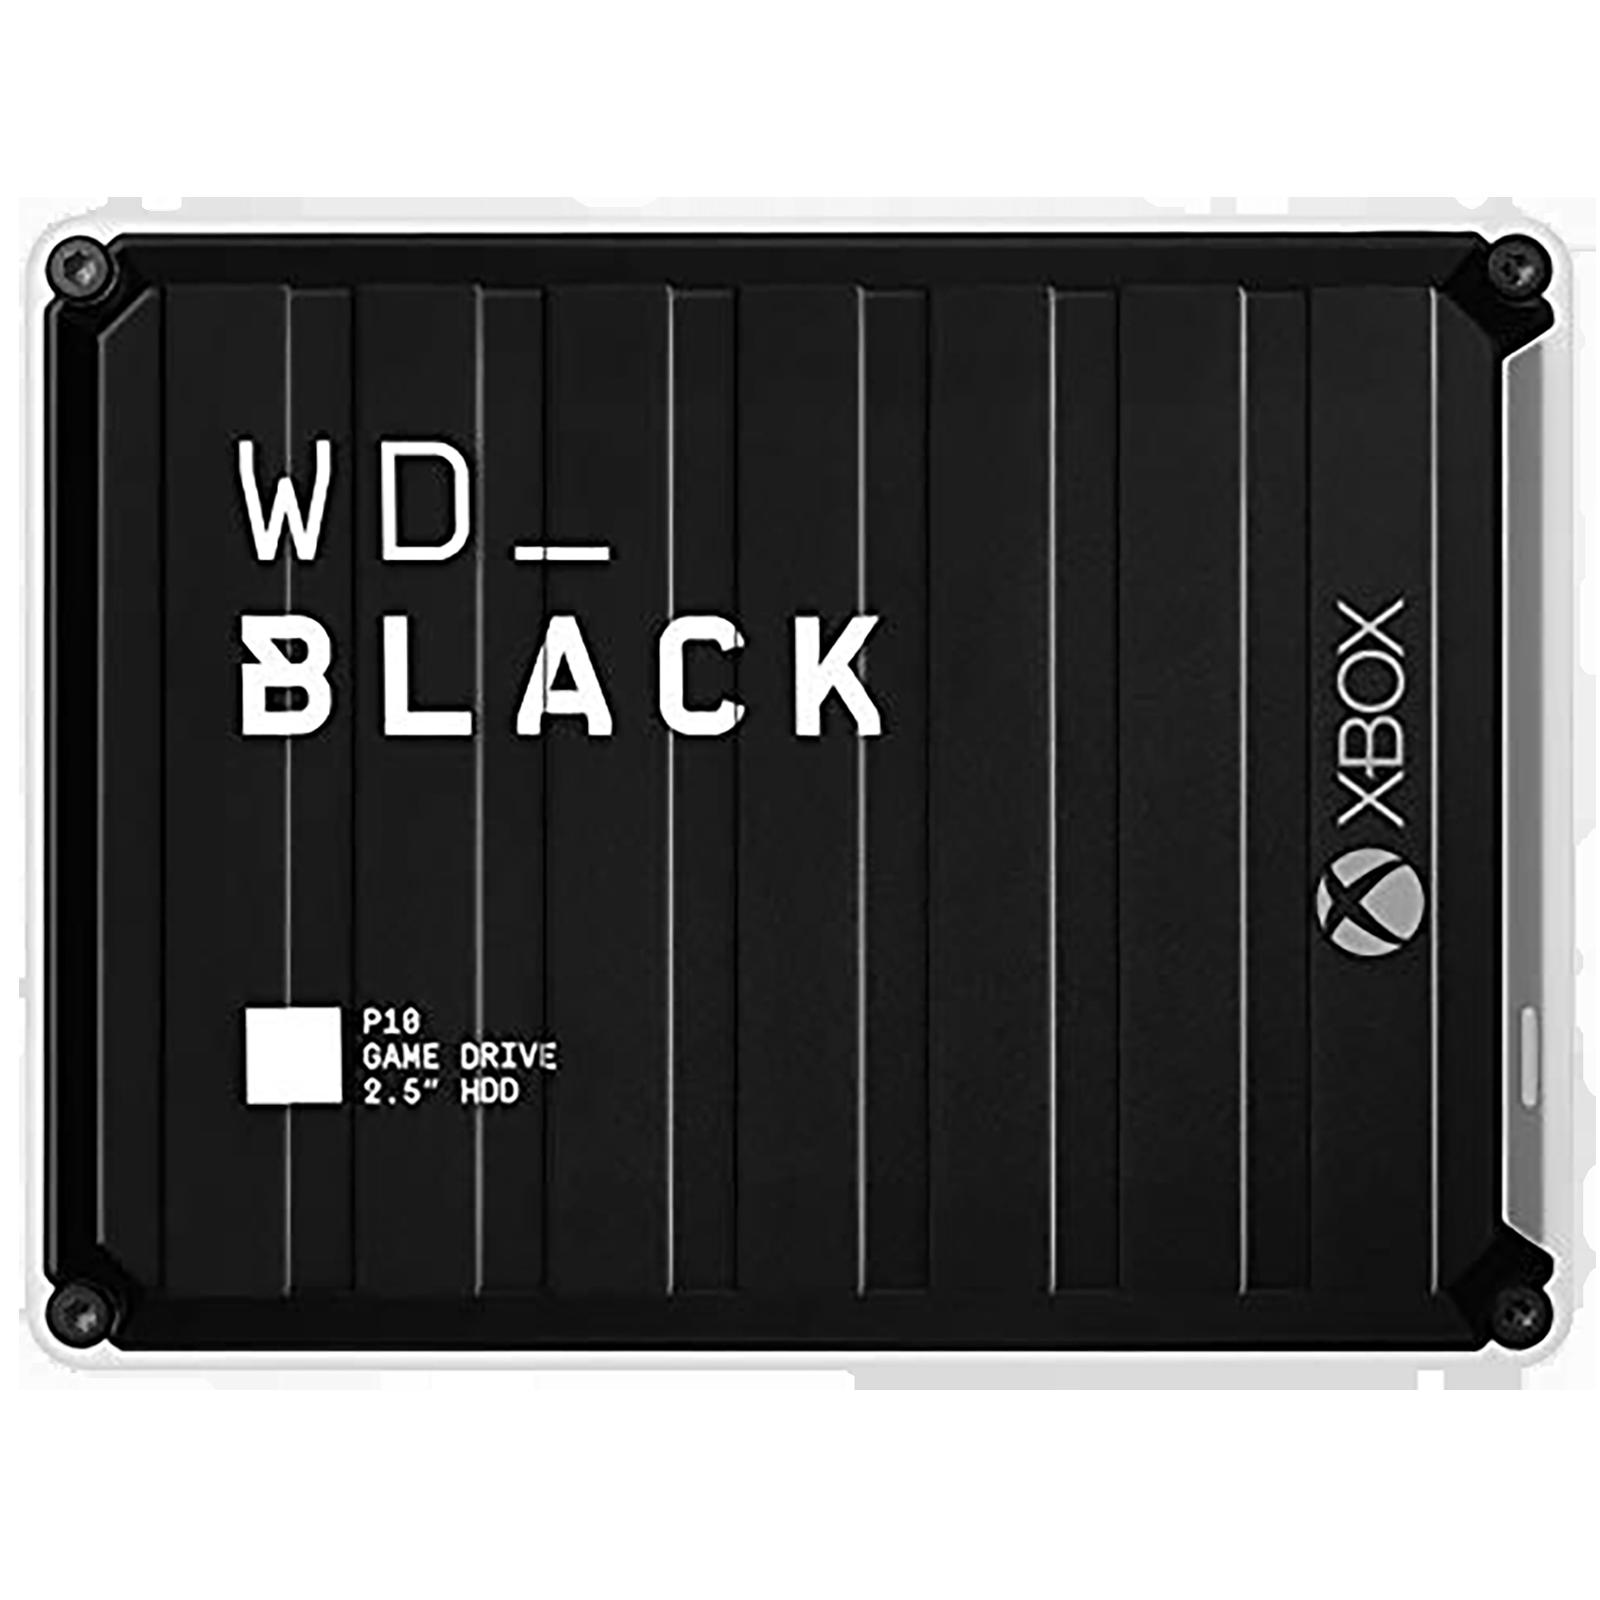 Western Digital WD_BLACK P10 5 TB USB 1.1 Game Drive (Purpose-Built For Gamers, WDBA5G0050BBK-WESN, Black)_1